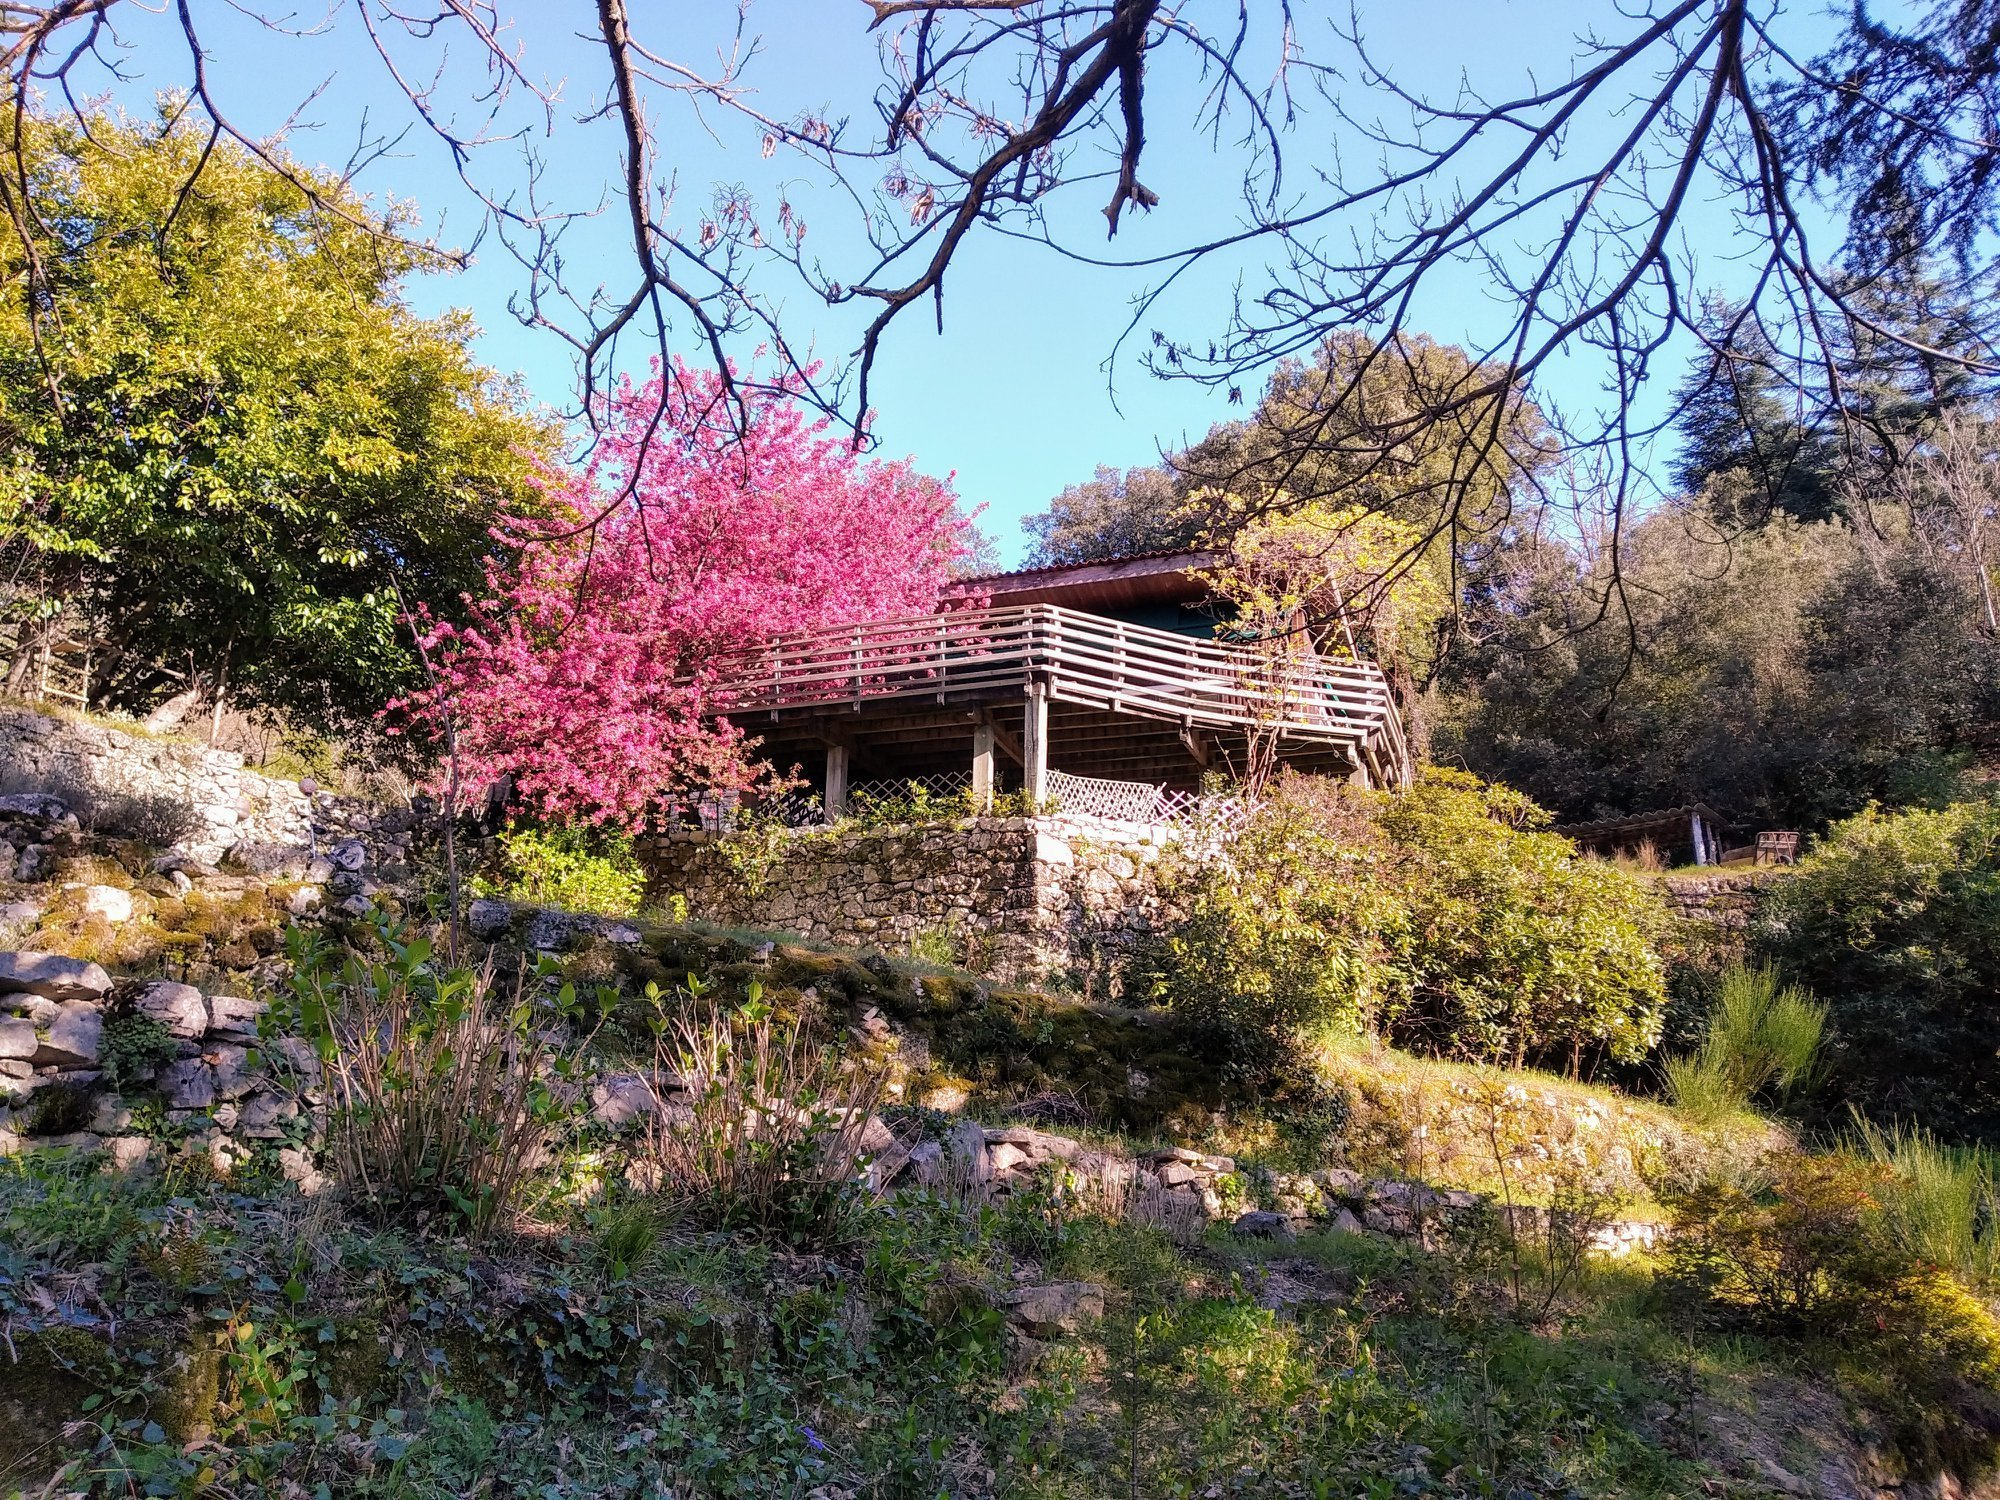 NaturoVida 30 - Chambres d'hôtes Pura Vida en face du Mont Aigoual à Valleraugue - Cévennes Gard